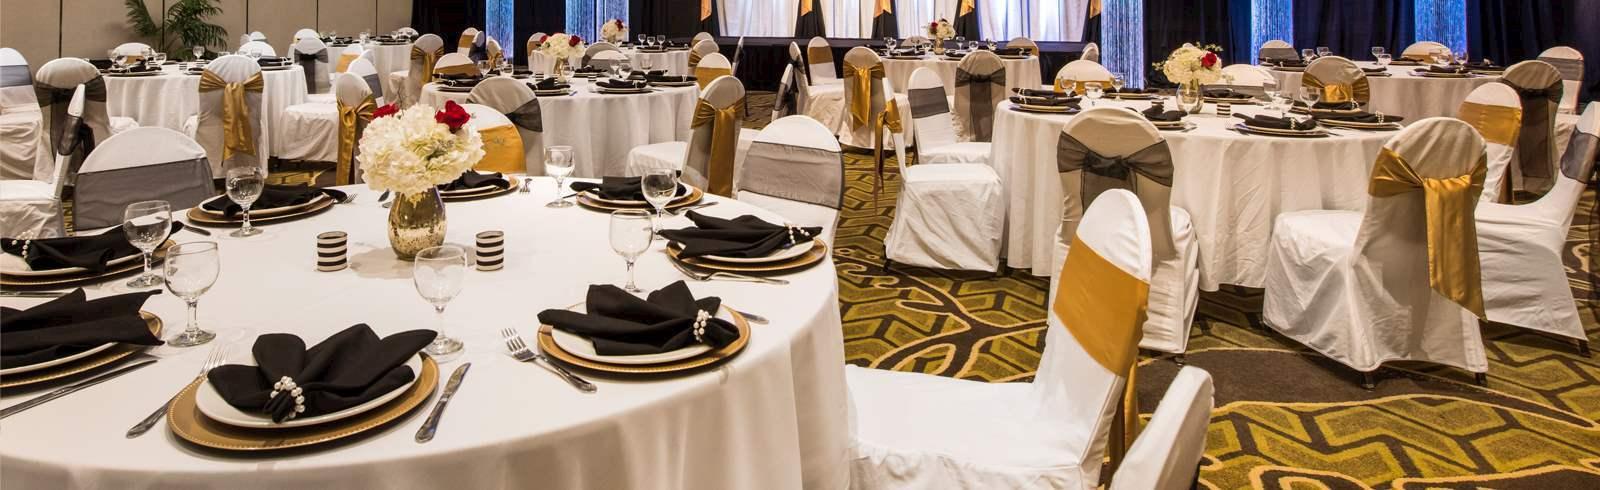 Meetings in Margaritaville Lake Resort Lake of the Ozarks, Osage Beach